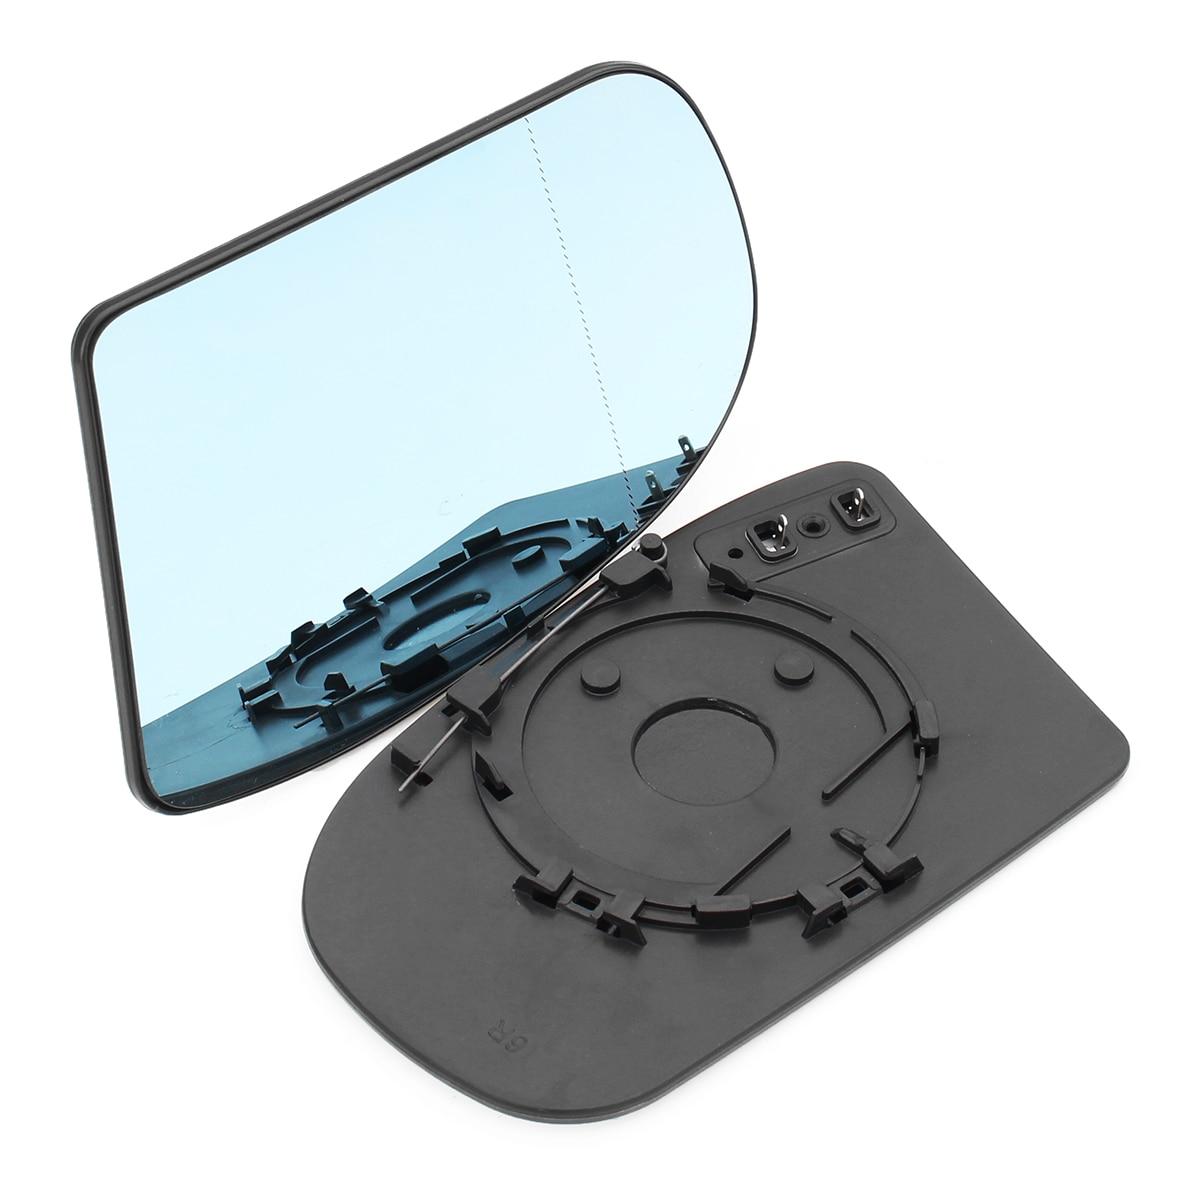 for Benz C & E Class W211 W203 Sedan E320 E350 E500 C230 C240 C280 C320 Left/Right Blue Anti Glare Rearview Mirror Glass